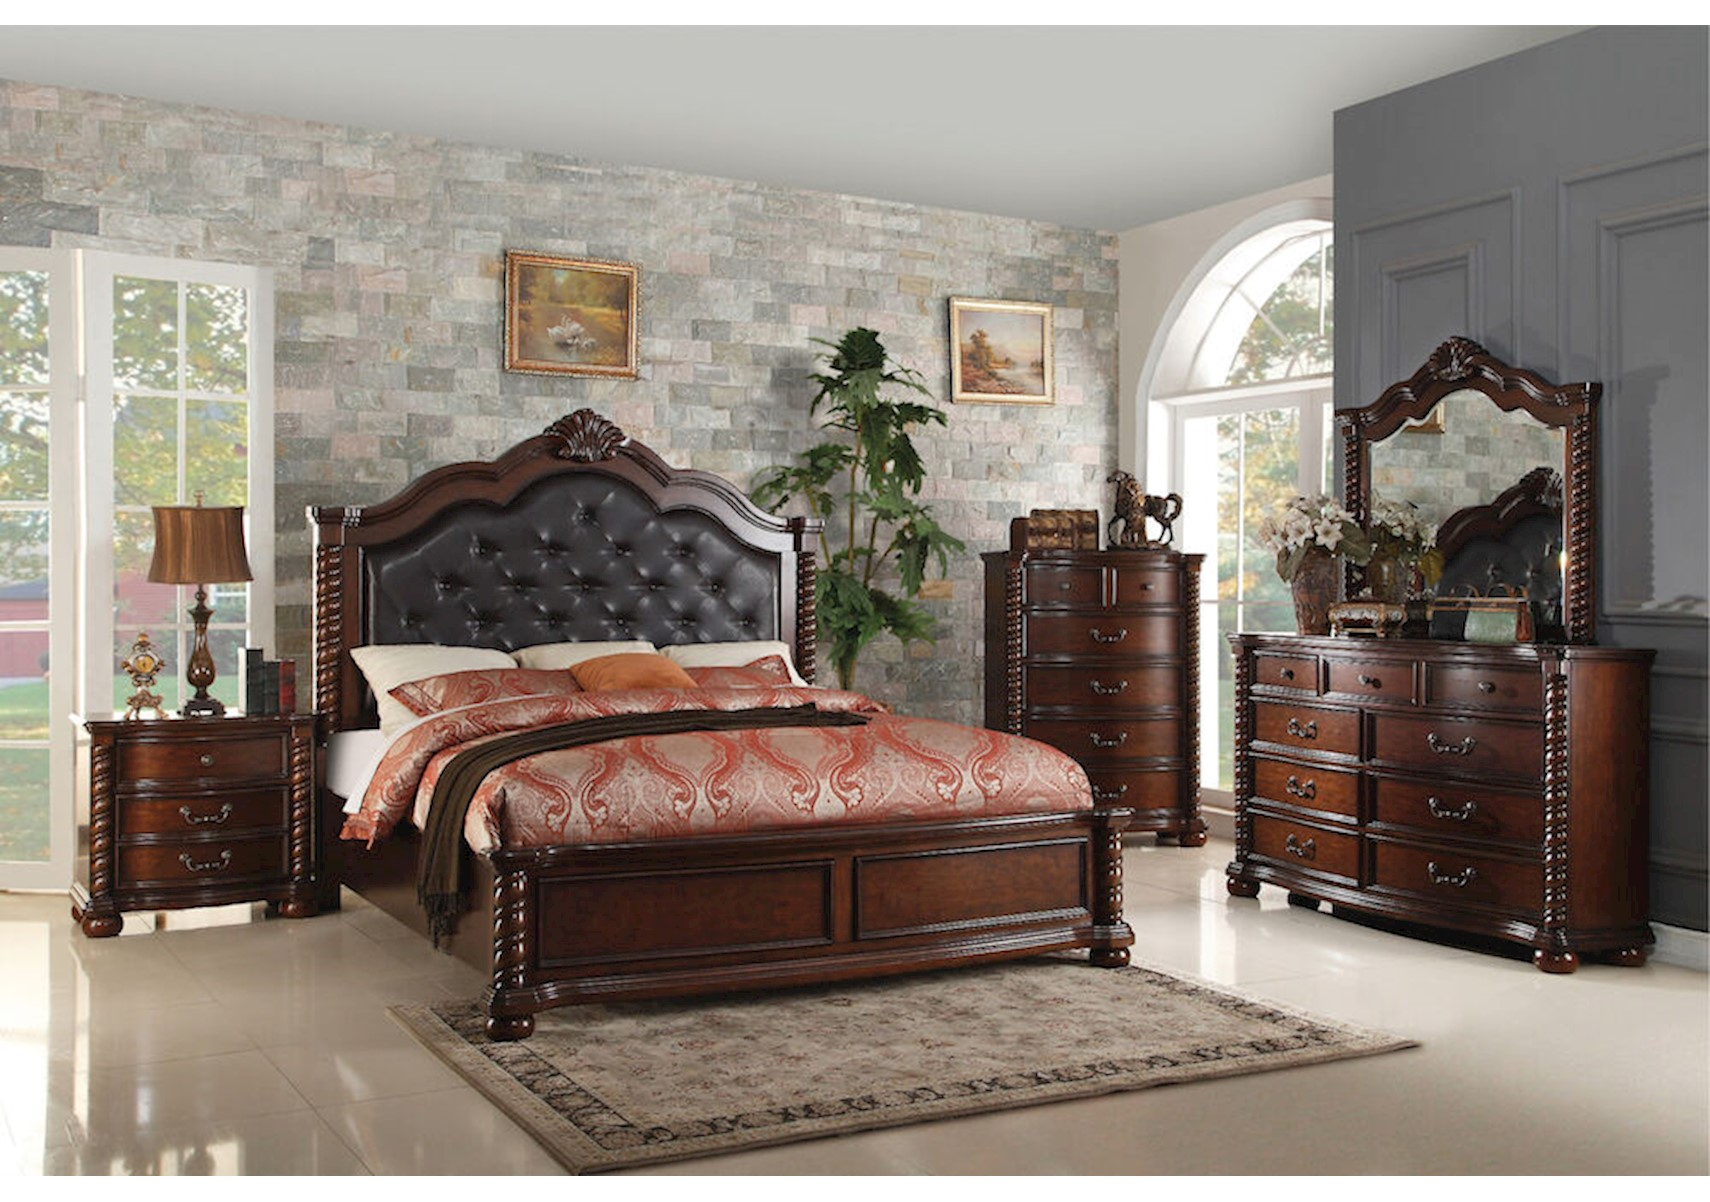 Lacks | Montarosa 4-Pc Queen Bedroom Set